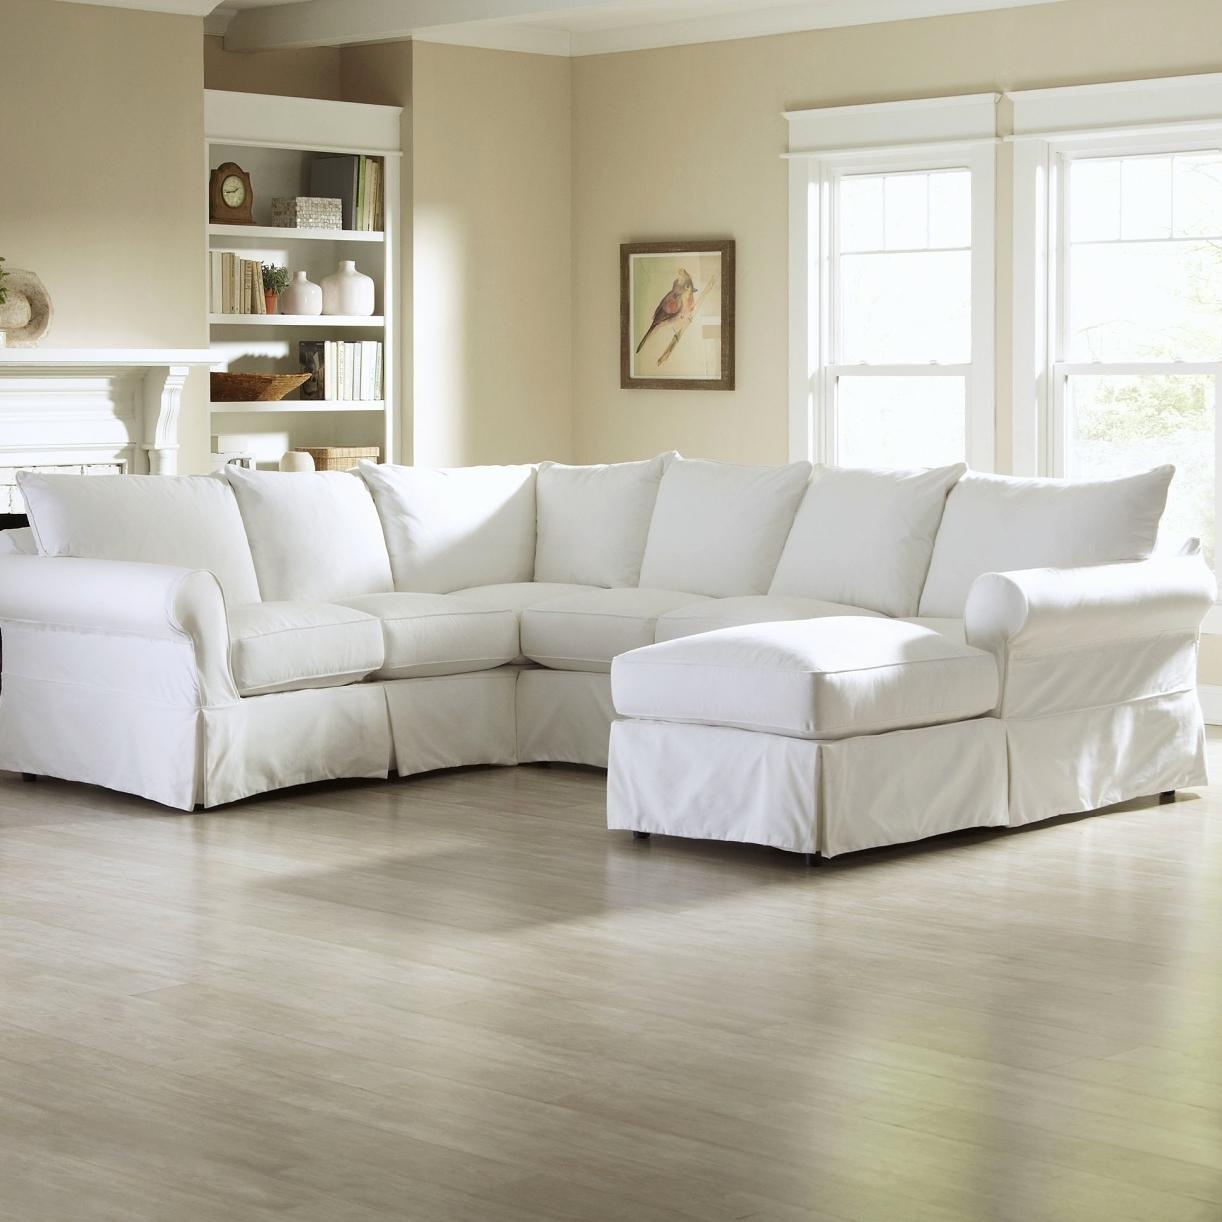 Fashionable 33 Ravishing Joss And Main Sectional Pics – Sectional Sofa Design Within Joss And Main Sectional Sofas (View 3 of 15)